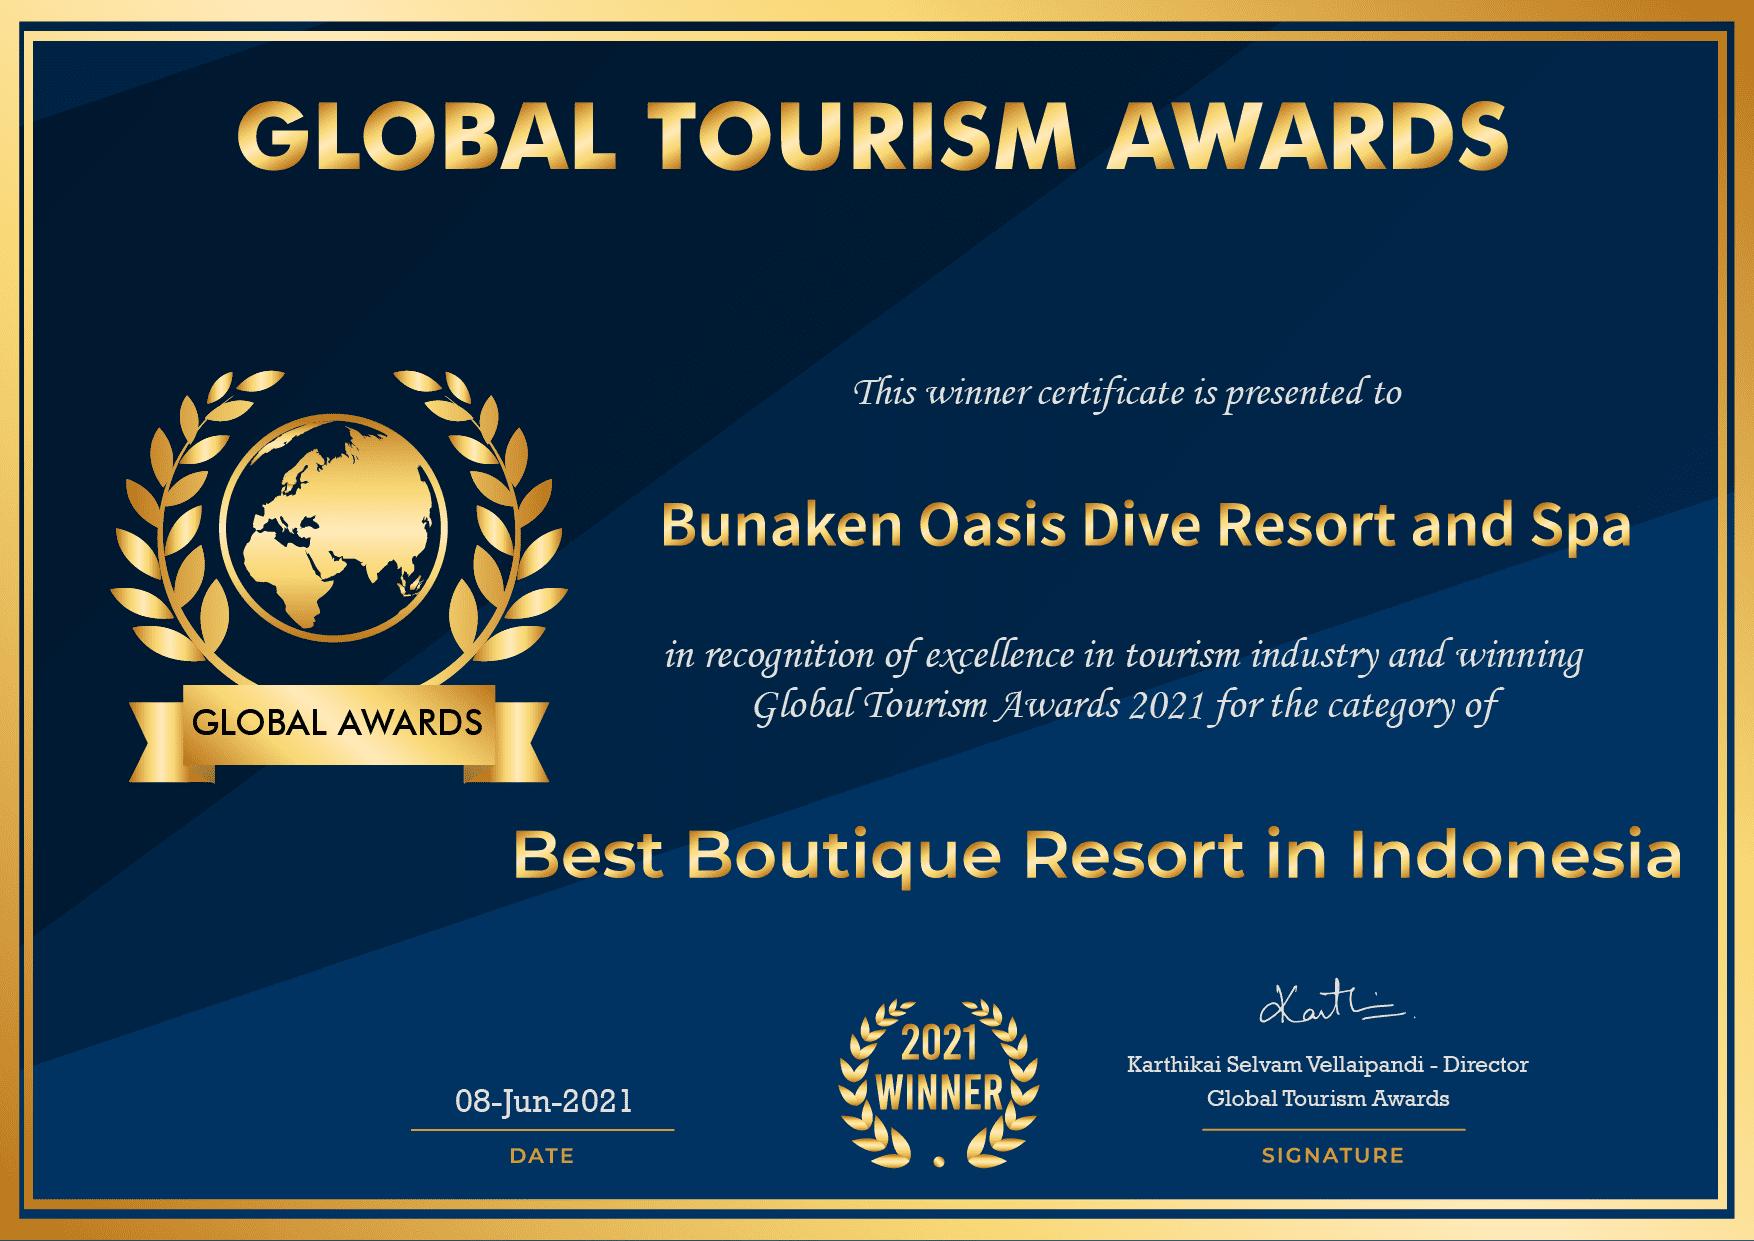 Global Tourism Awards winner certificate